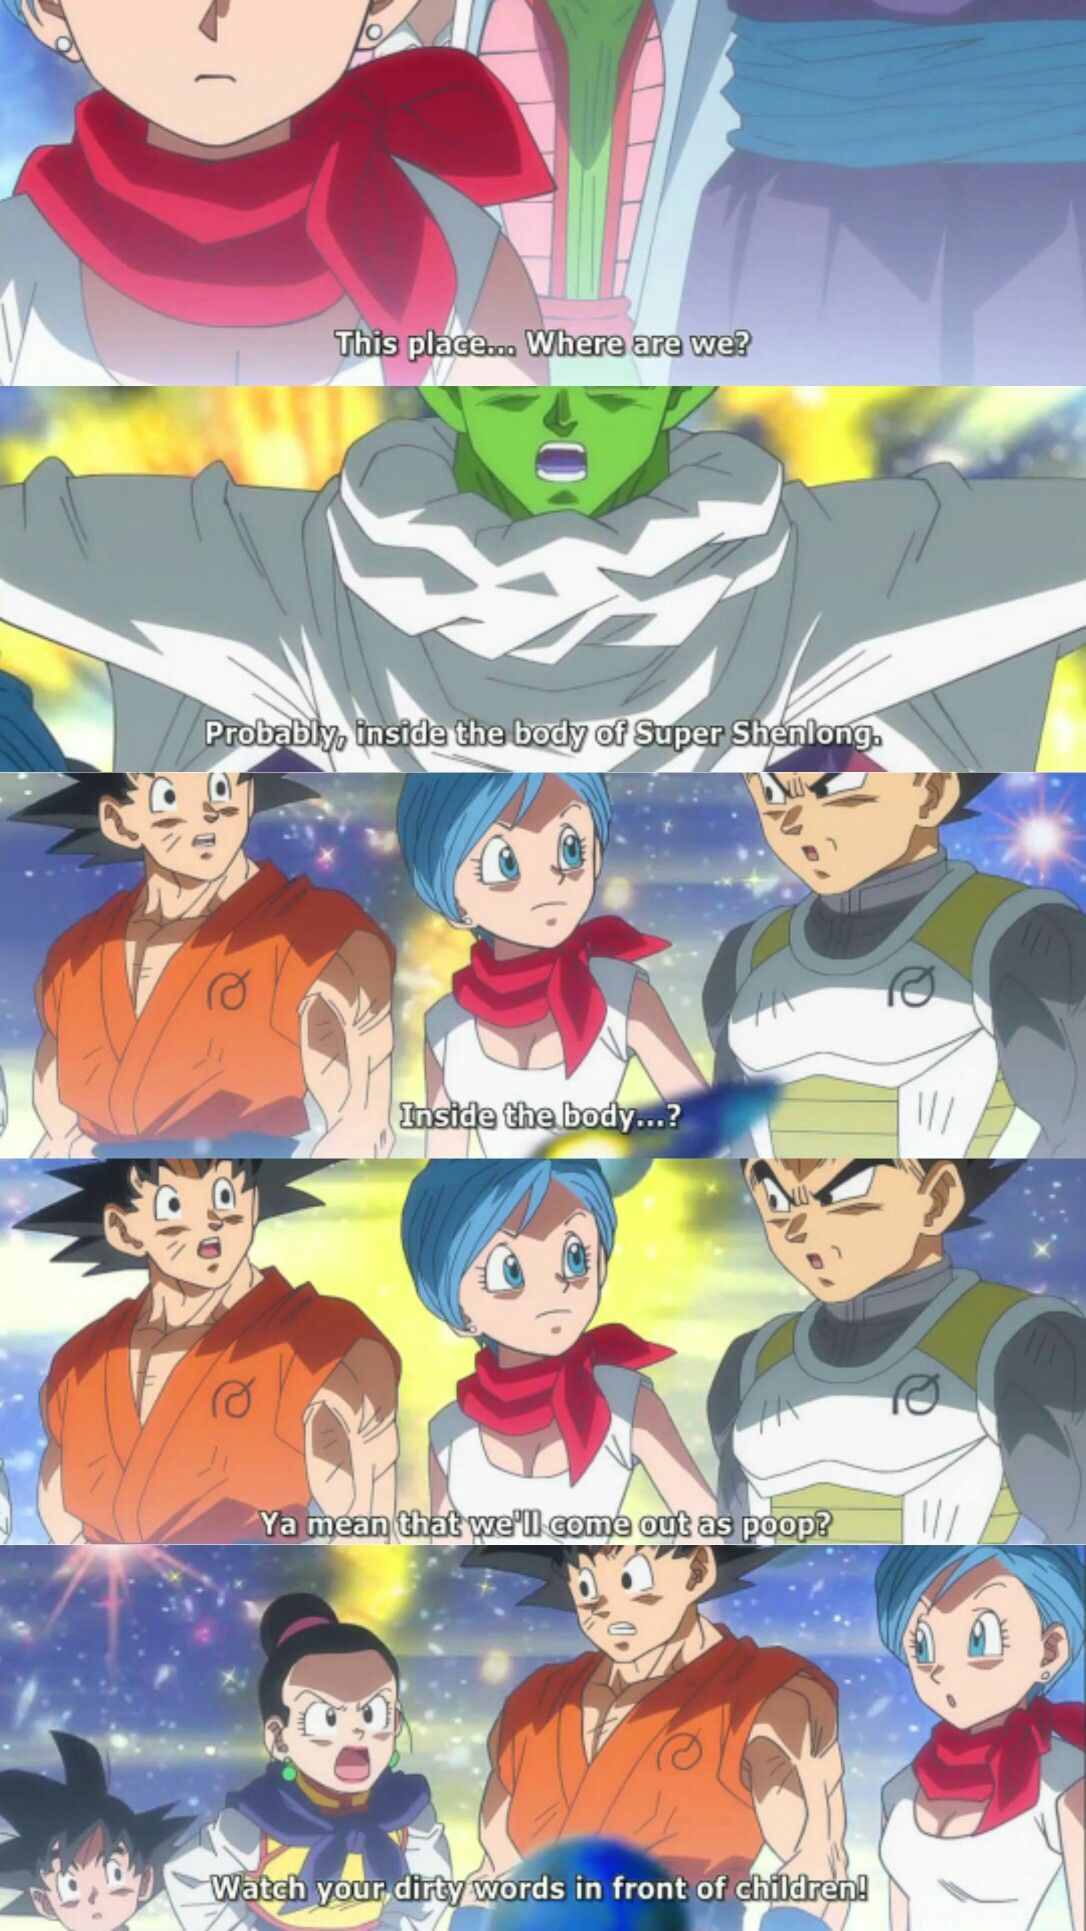 9a703261 Goku, Vegeta, Bulma, Piccolo, and Chichi | Funny Memes/ECards ...